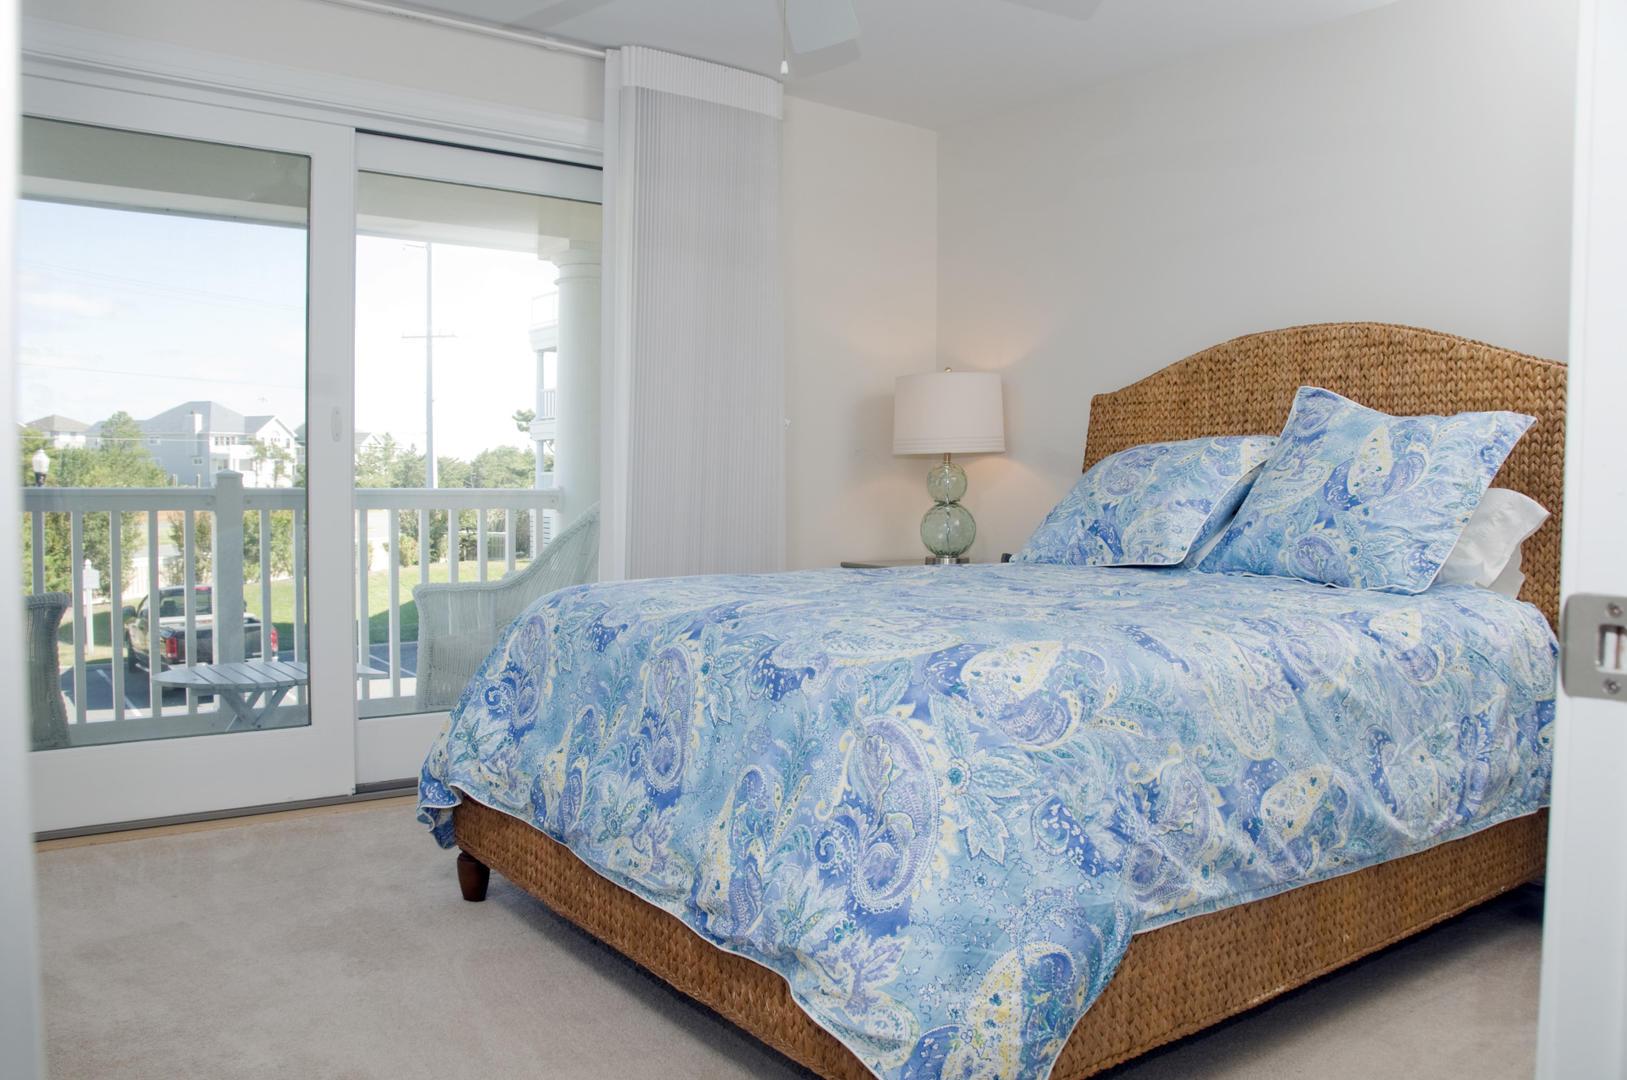 Salt Meadows 40142 - Bedroom 3